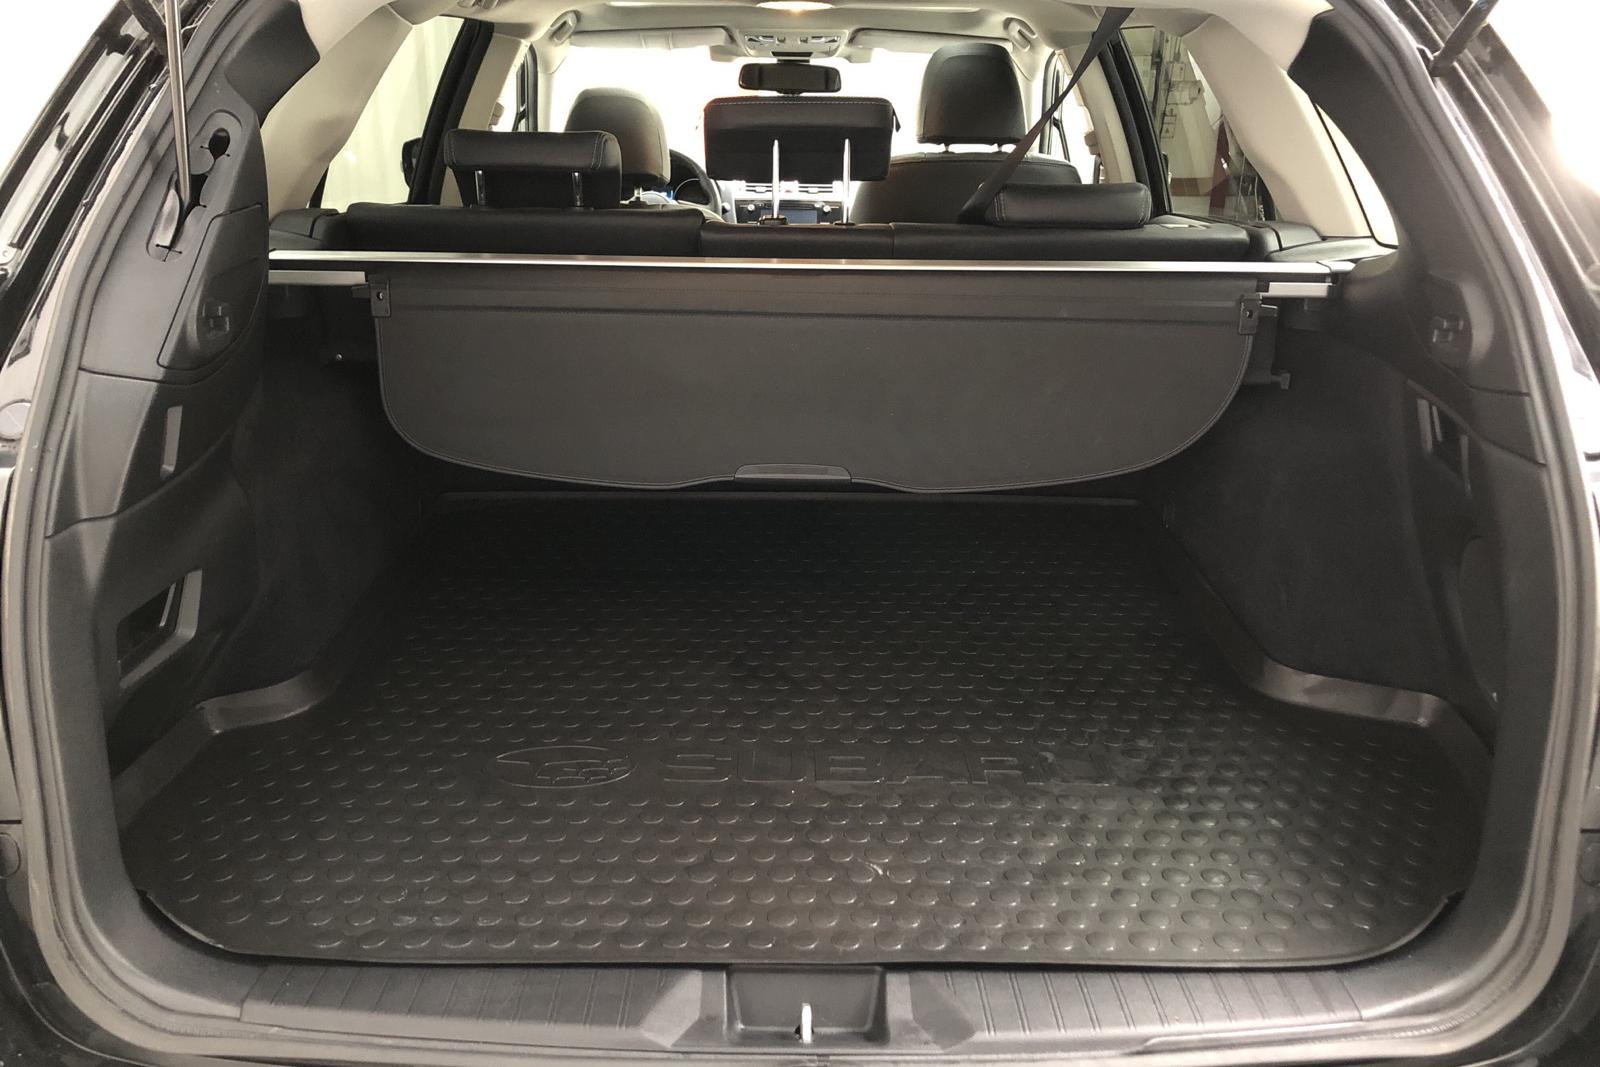 Subaru Outback 2.0D 4WD (150hk) - 0 km - black - 2017